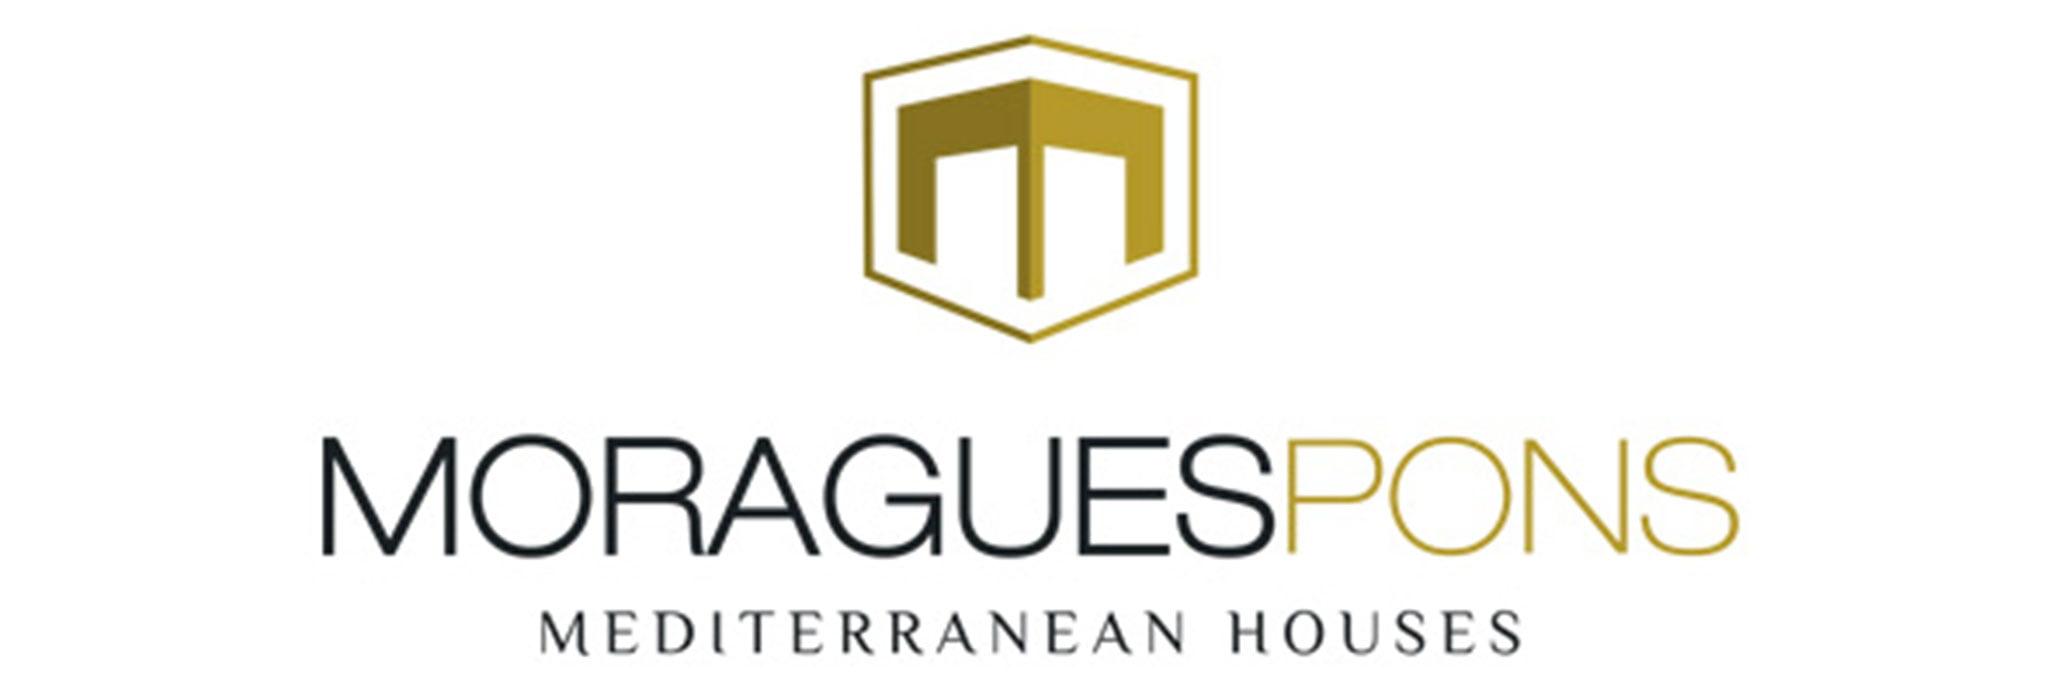 Logotipo de MORAGUESPONS Mediterranean Houses